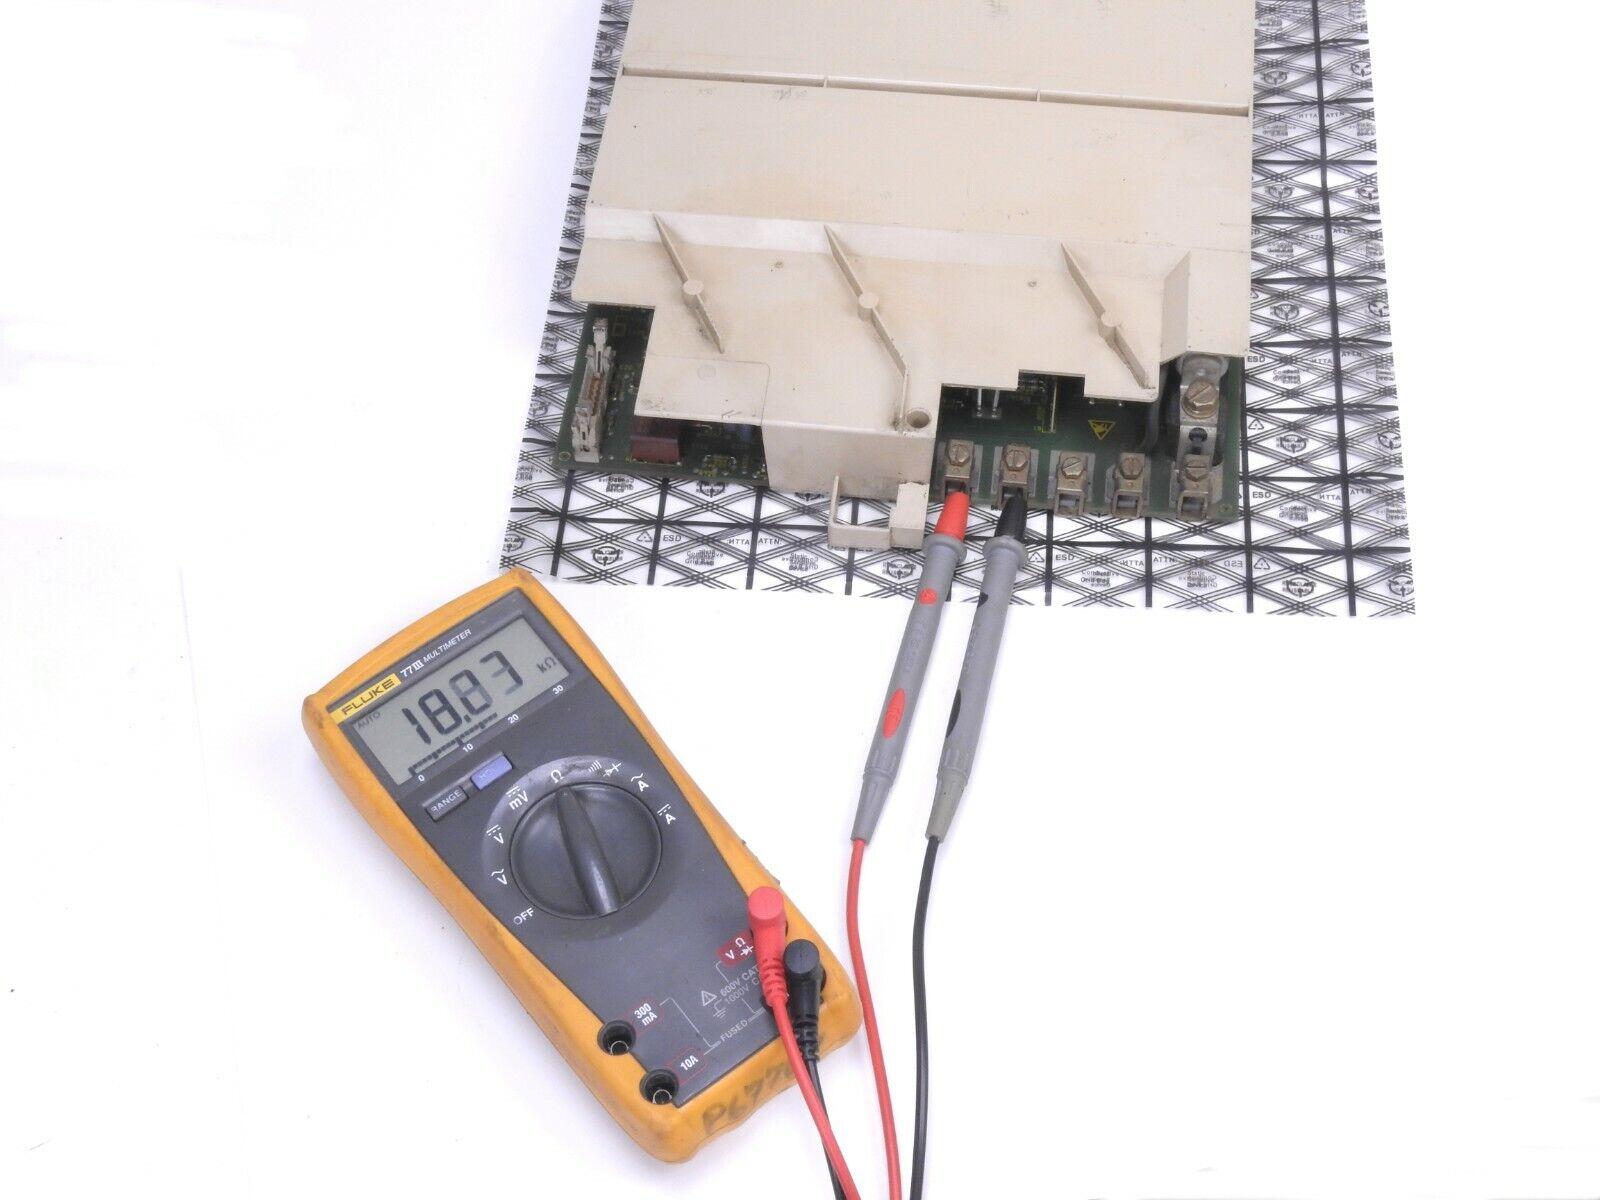 Siemens SimoDrive 6SC6140-0FE01